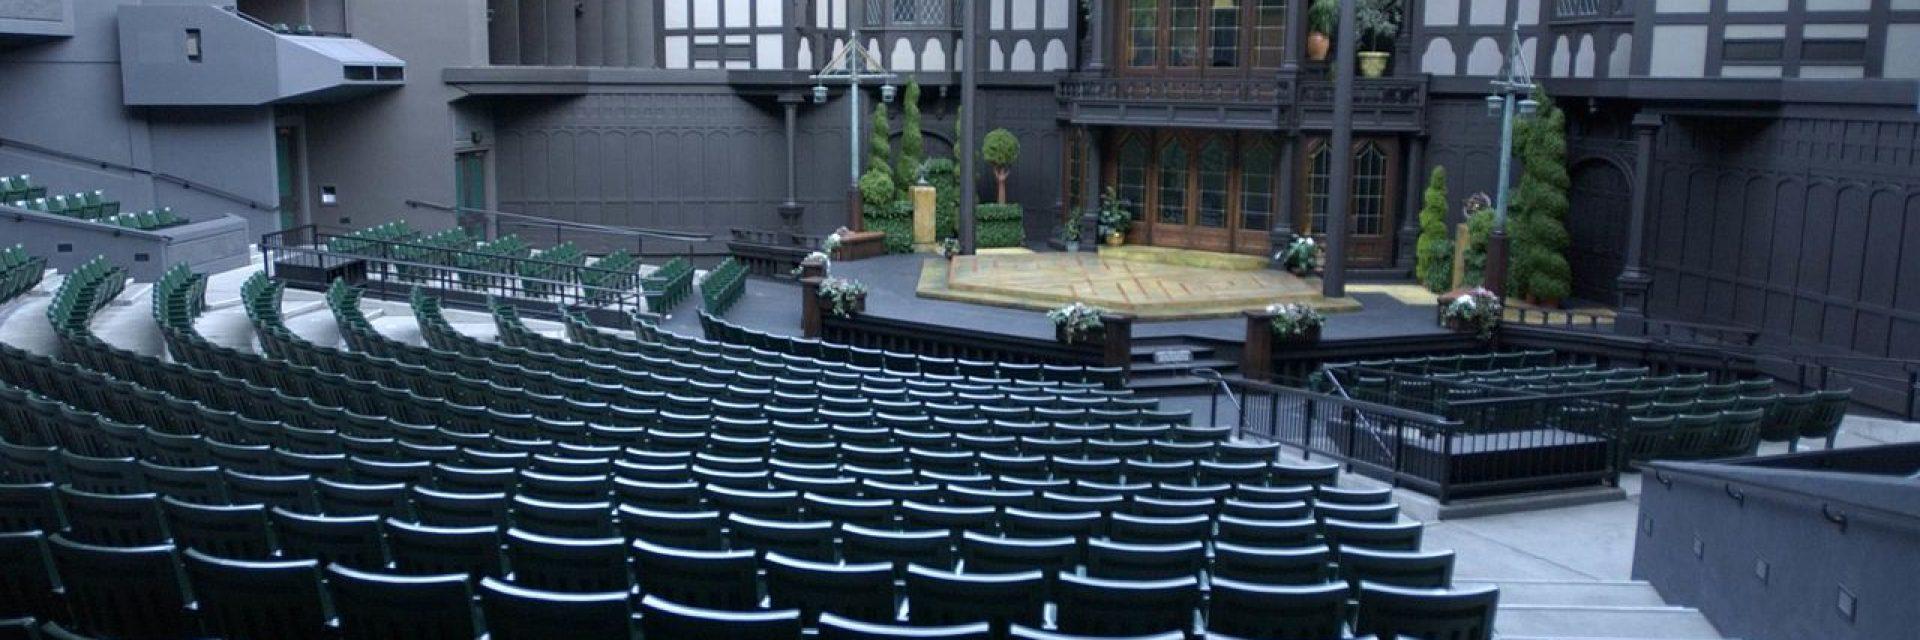 The Oregon Shakespeare Festival